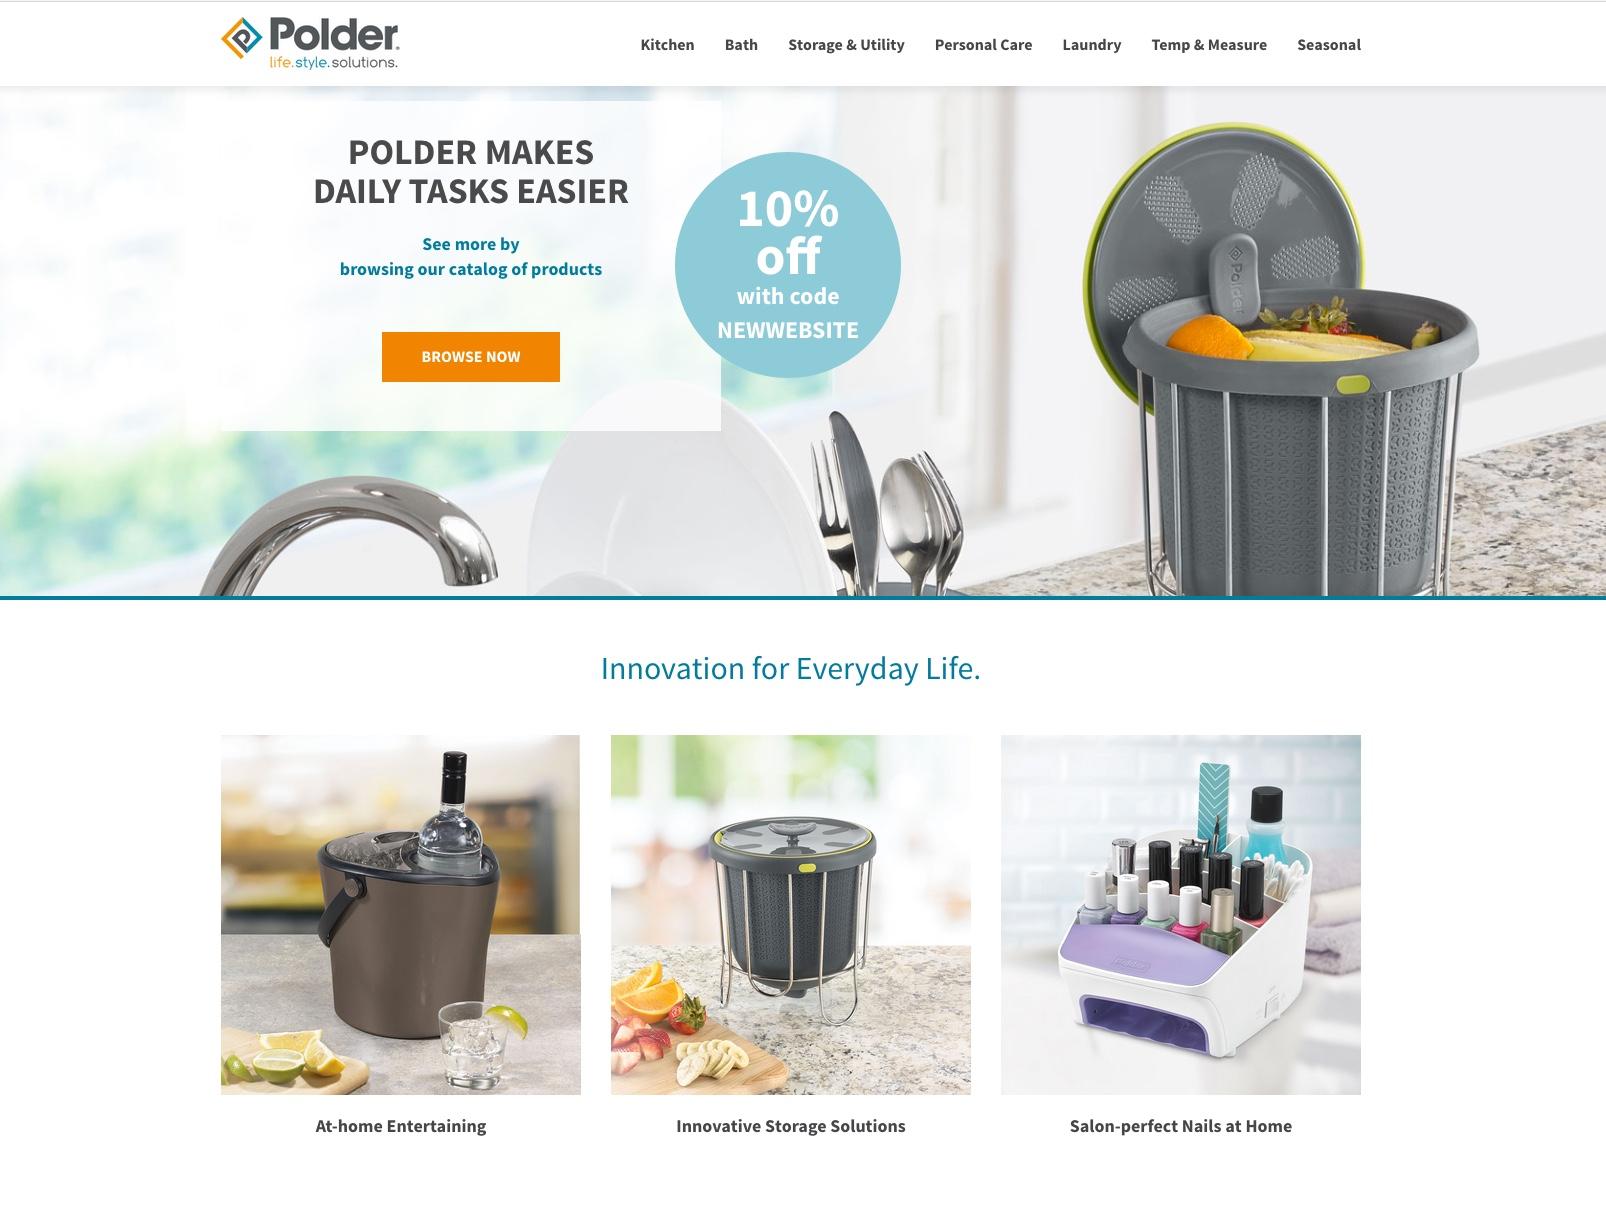 Polder Launches New Website and Award-Winning Branding Update